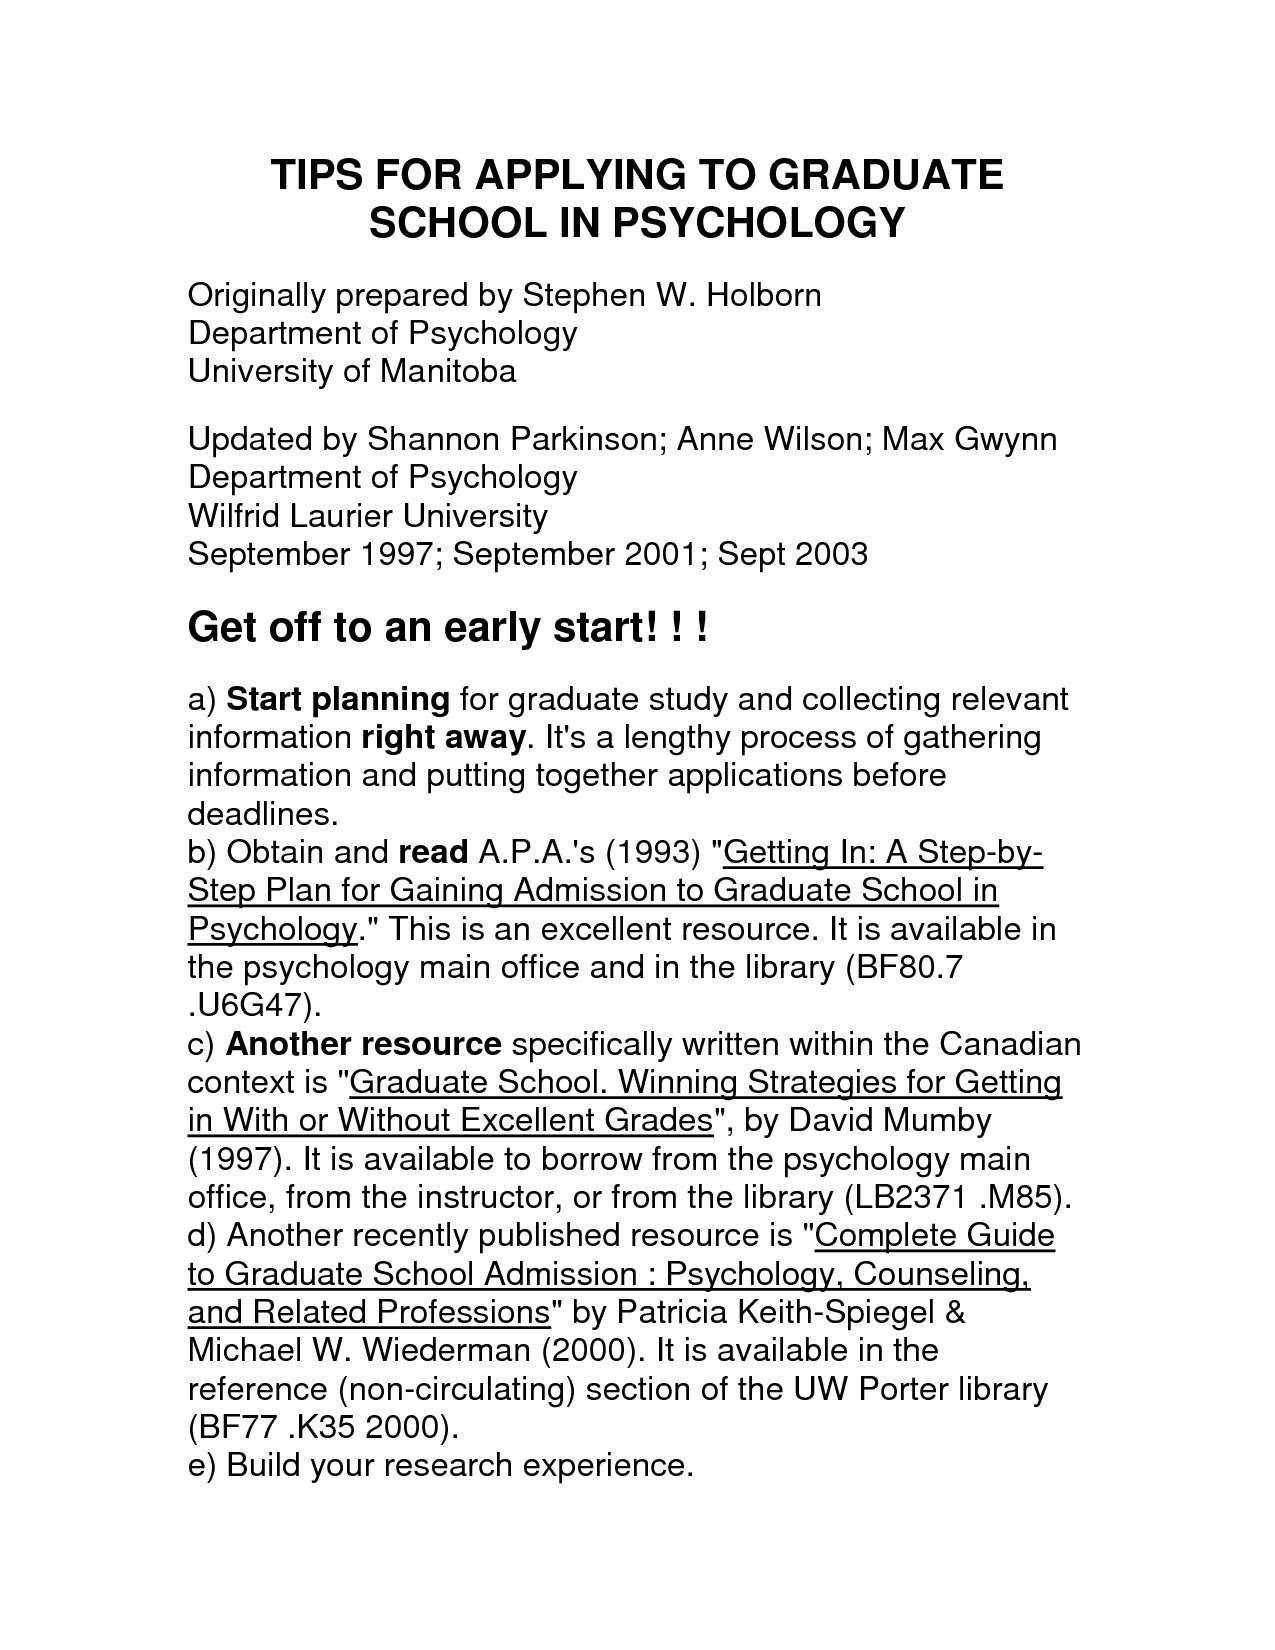 sample resume graduate school